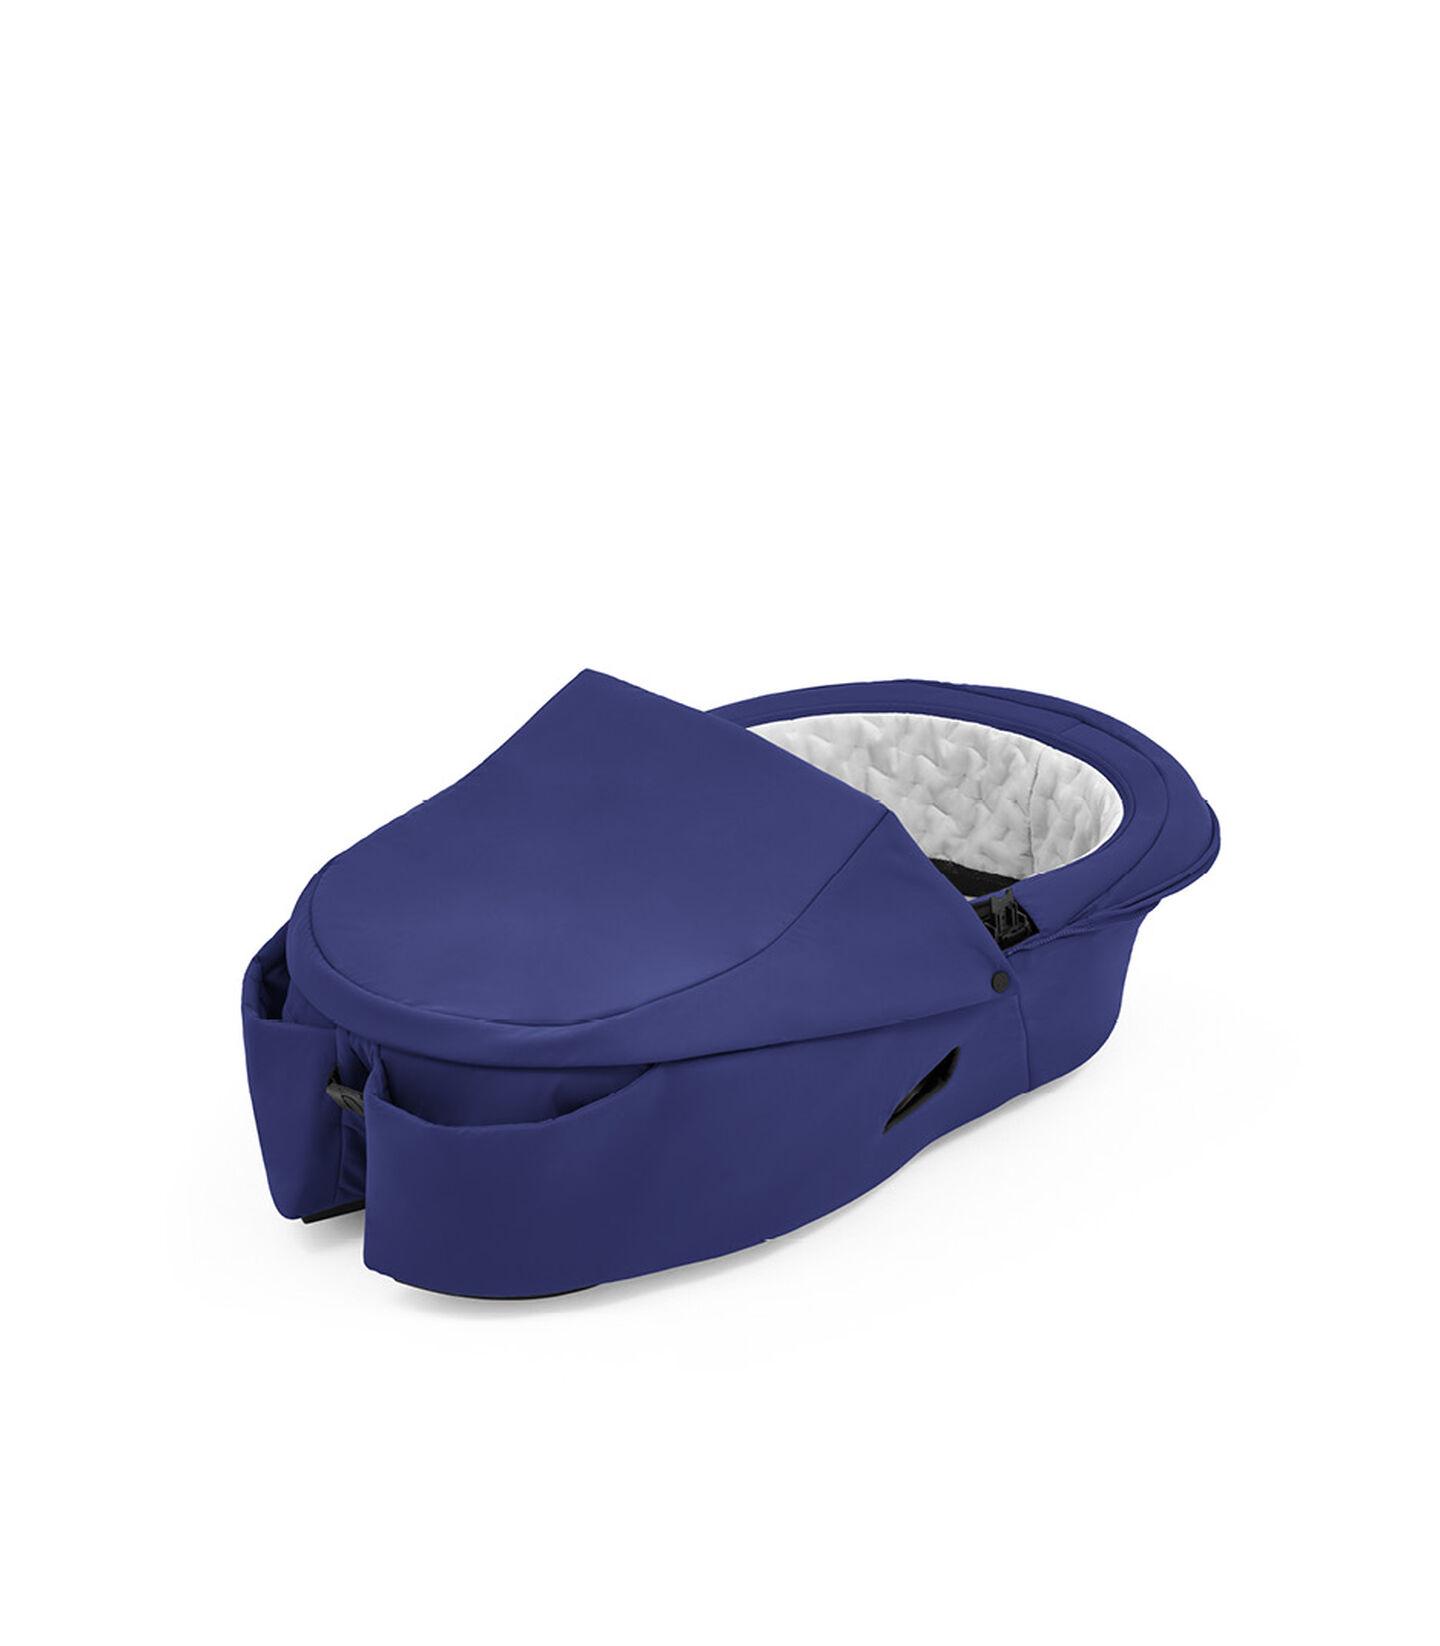 Stokke® Xplory® X Carry Cot Royal Blue, Royal Blue, mainview view 1